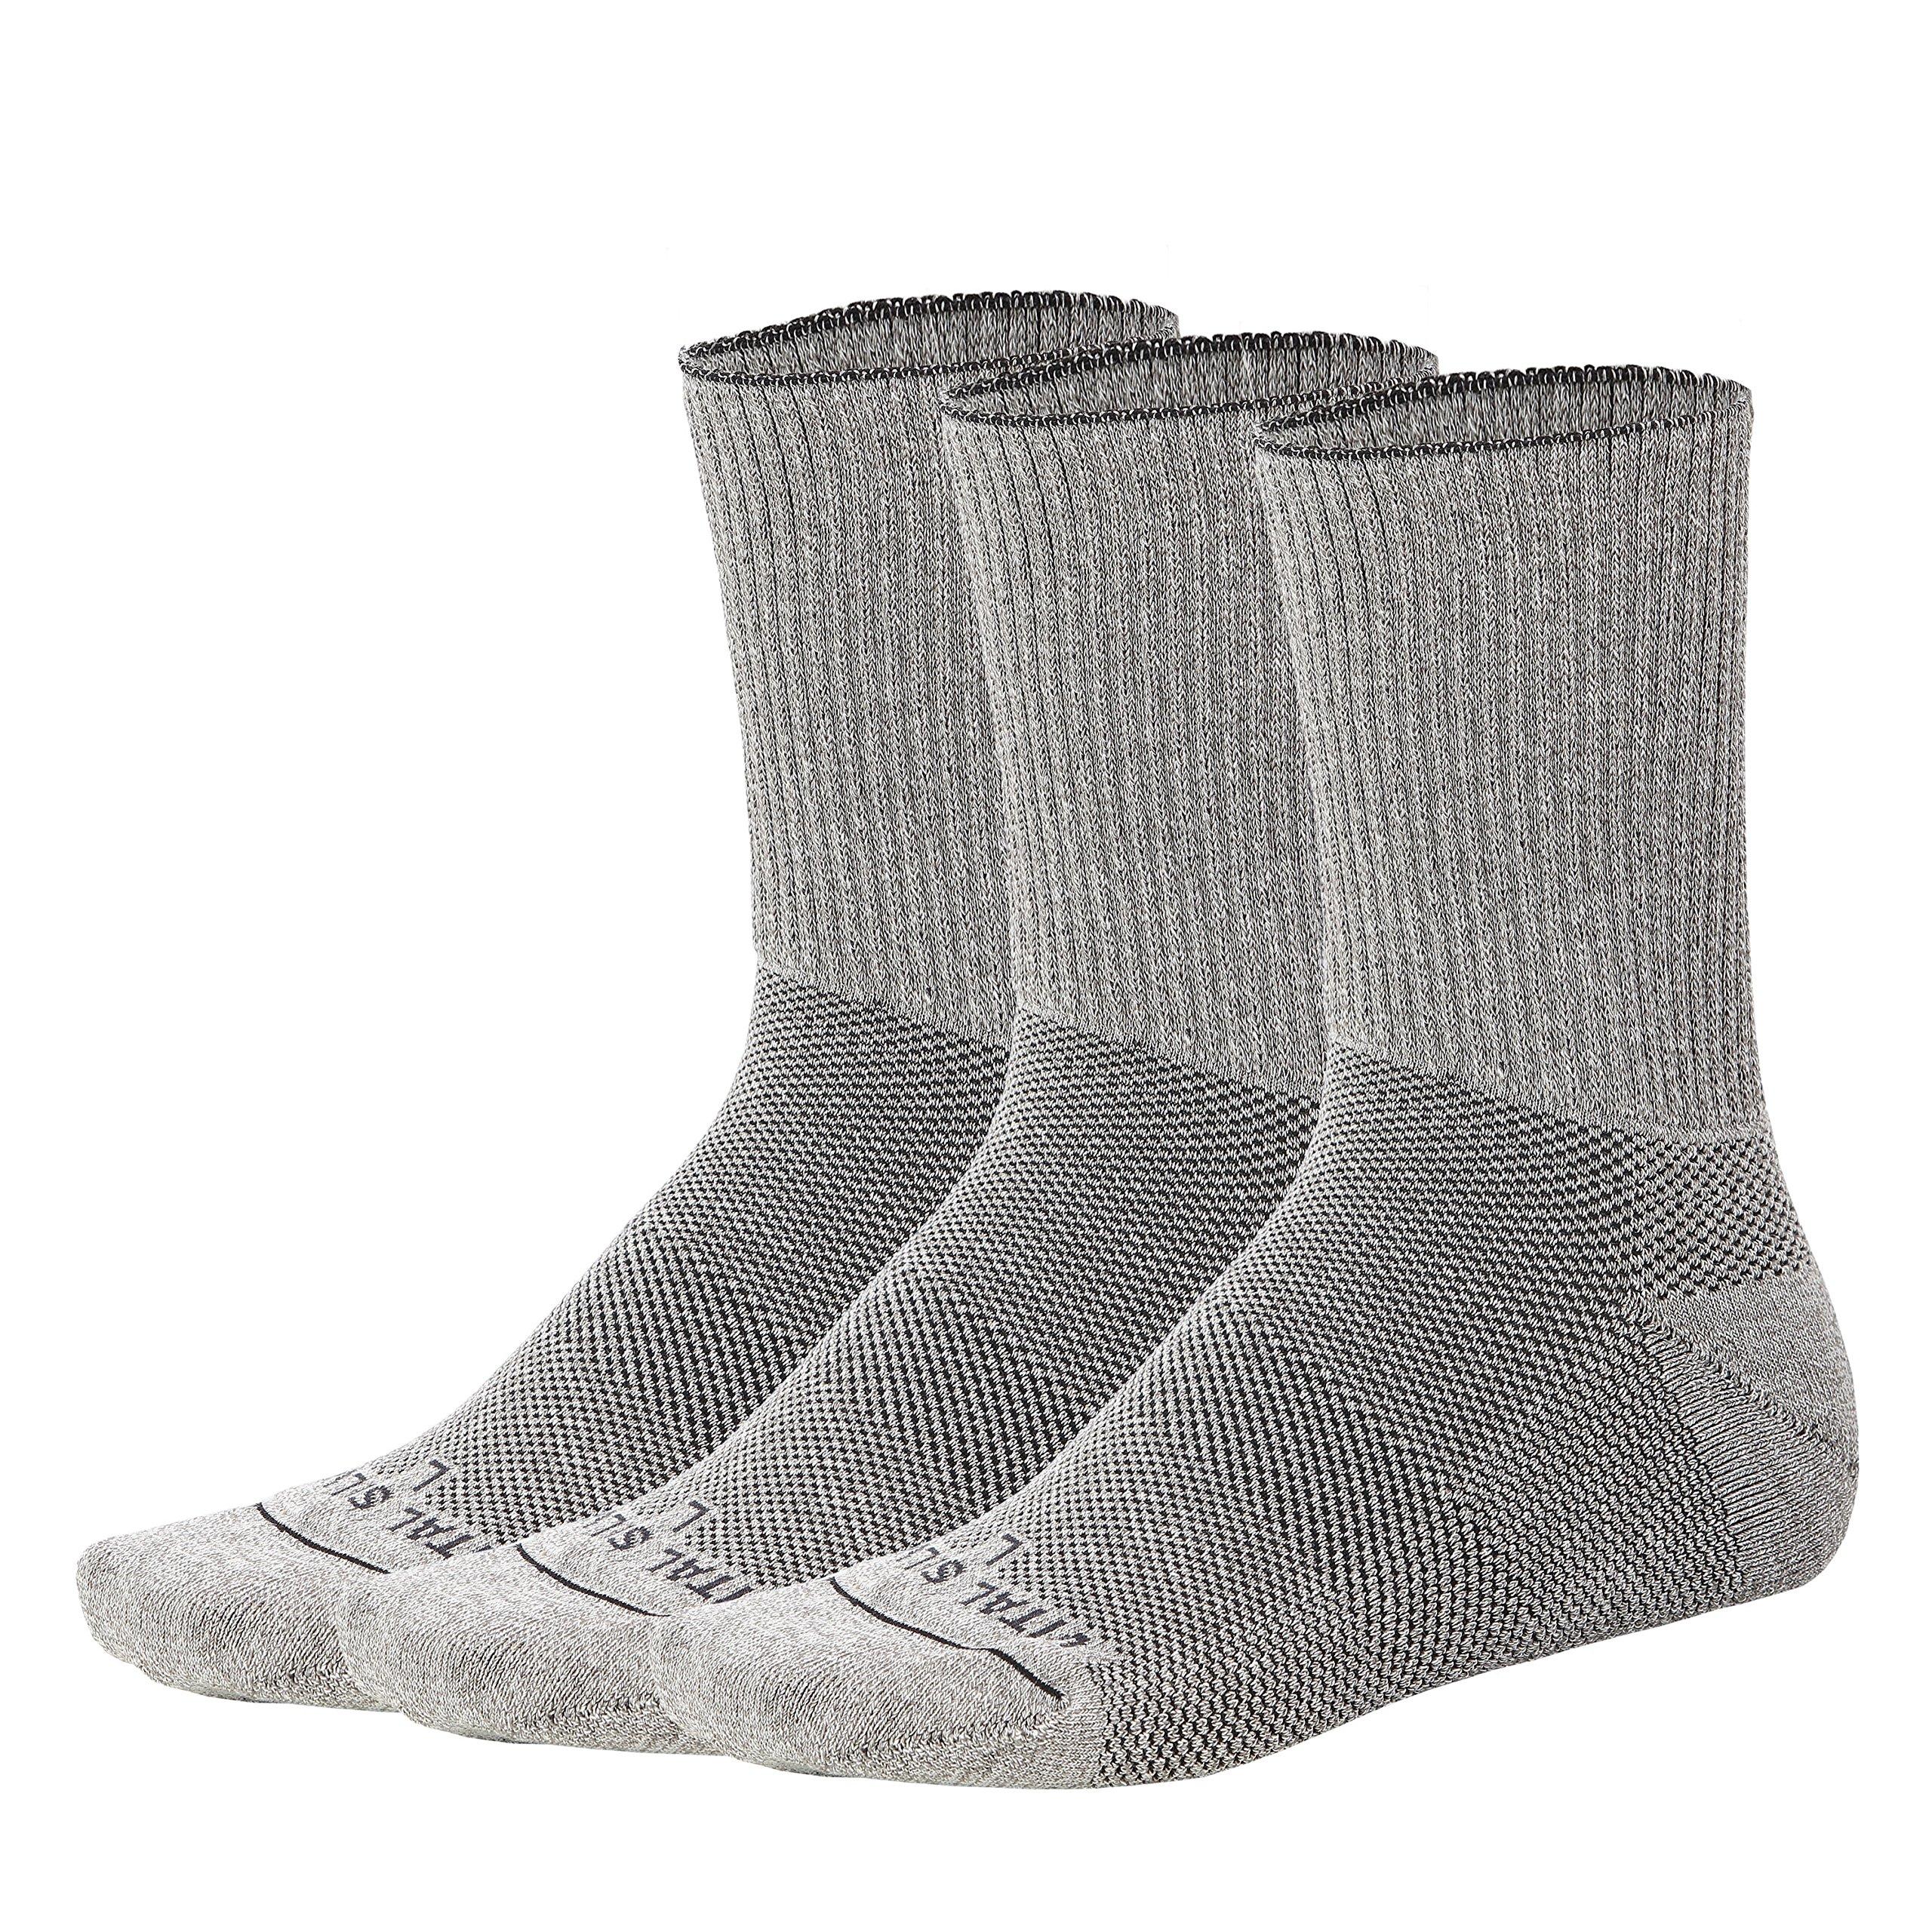 Vital Salveo- Soft Non Binding Seamless Circulation Diabetic Socks- Crew long (3 pairs) L by Vital Salveo